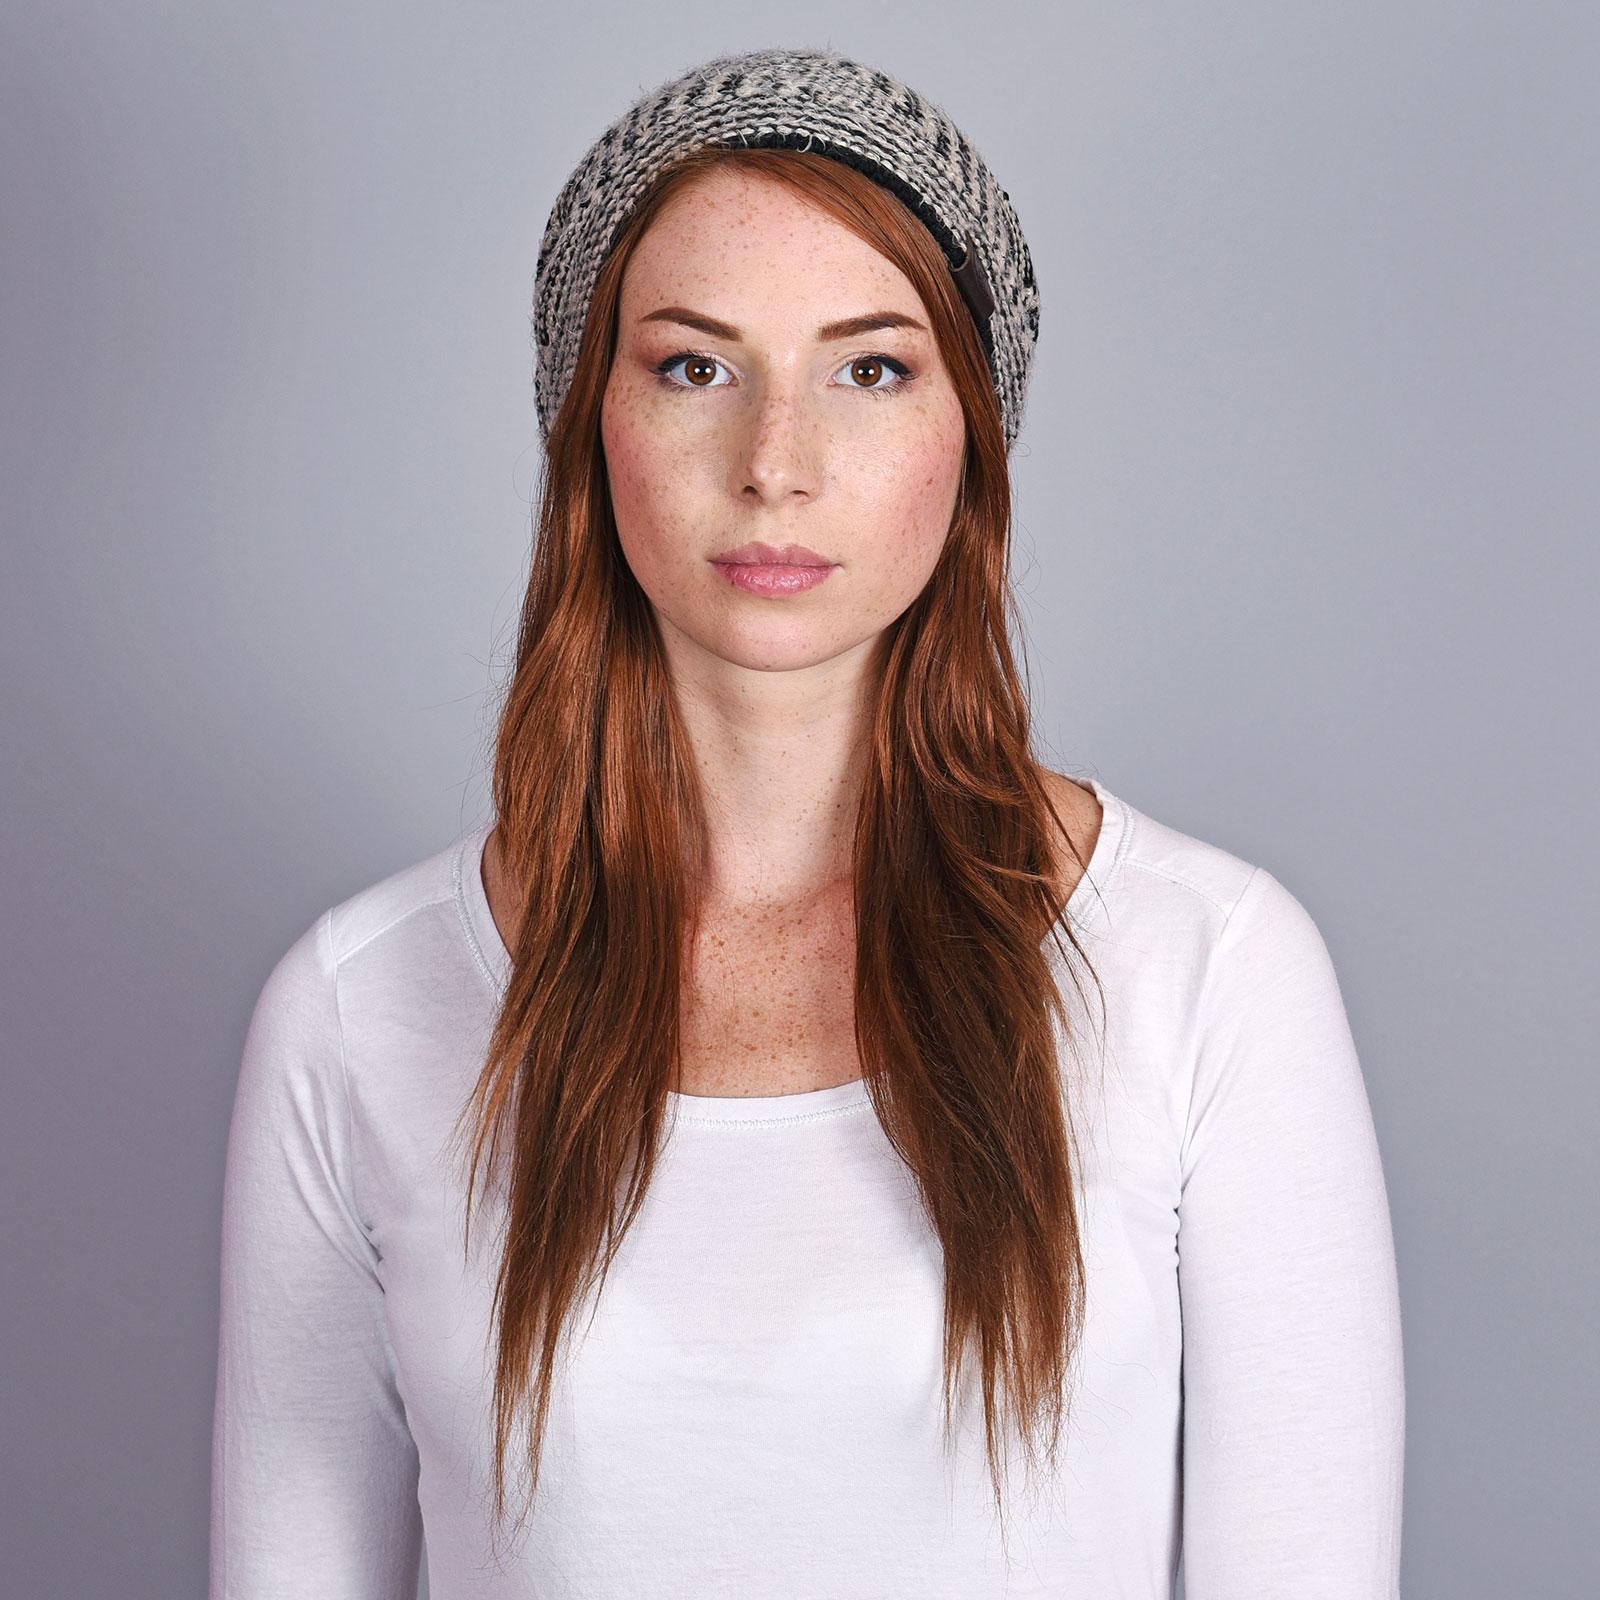 CP-01048-VF16-2-bonnet-long-femme-noir-beige